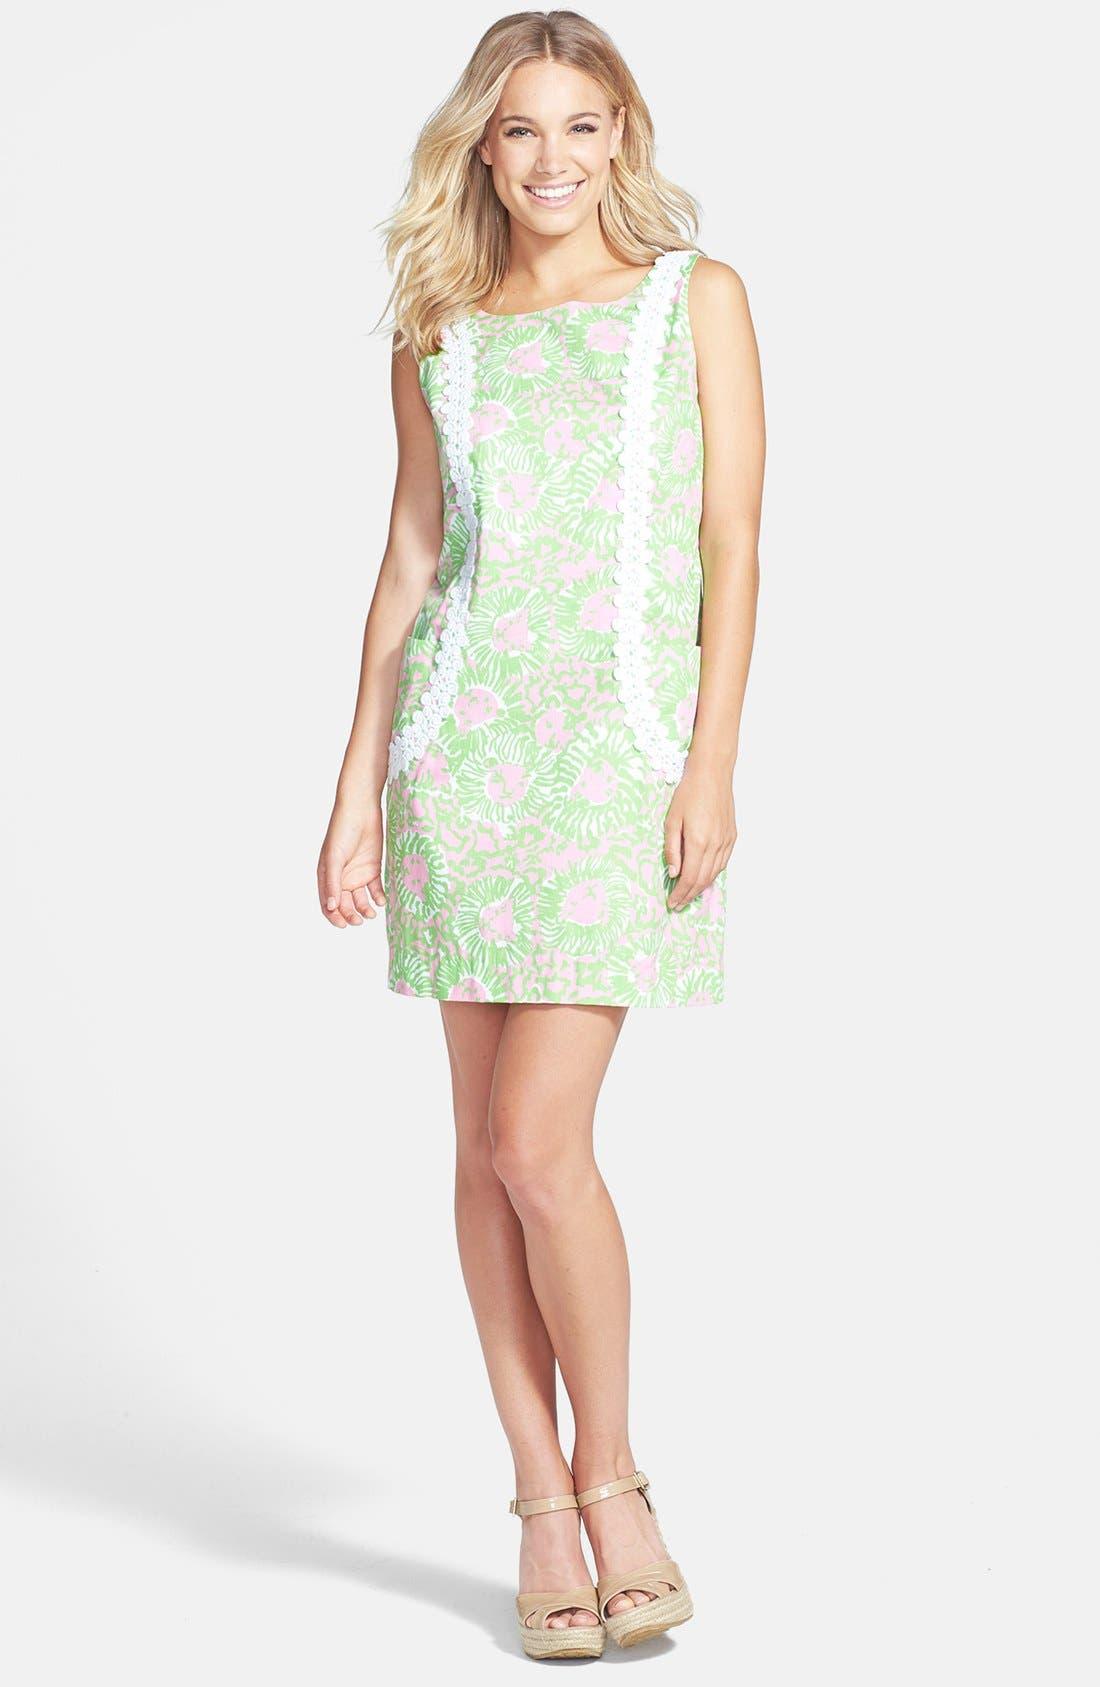 Main Image - Lilly Pulitzer® 'Liz' Print Shift Dress